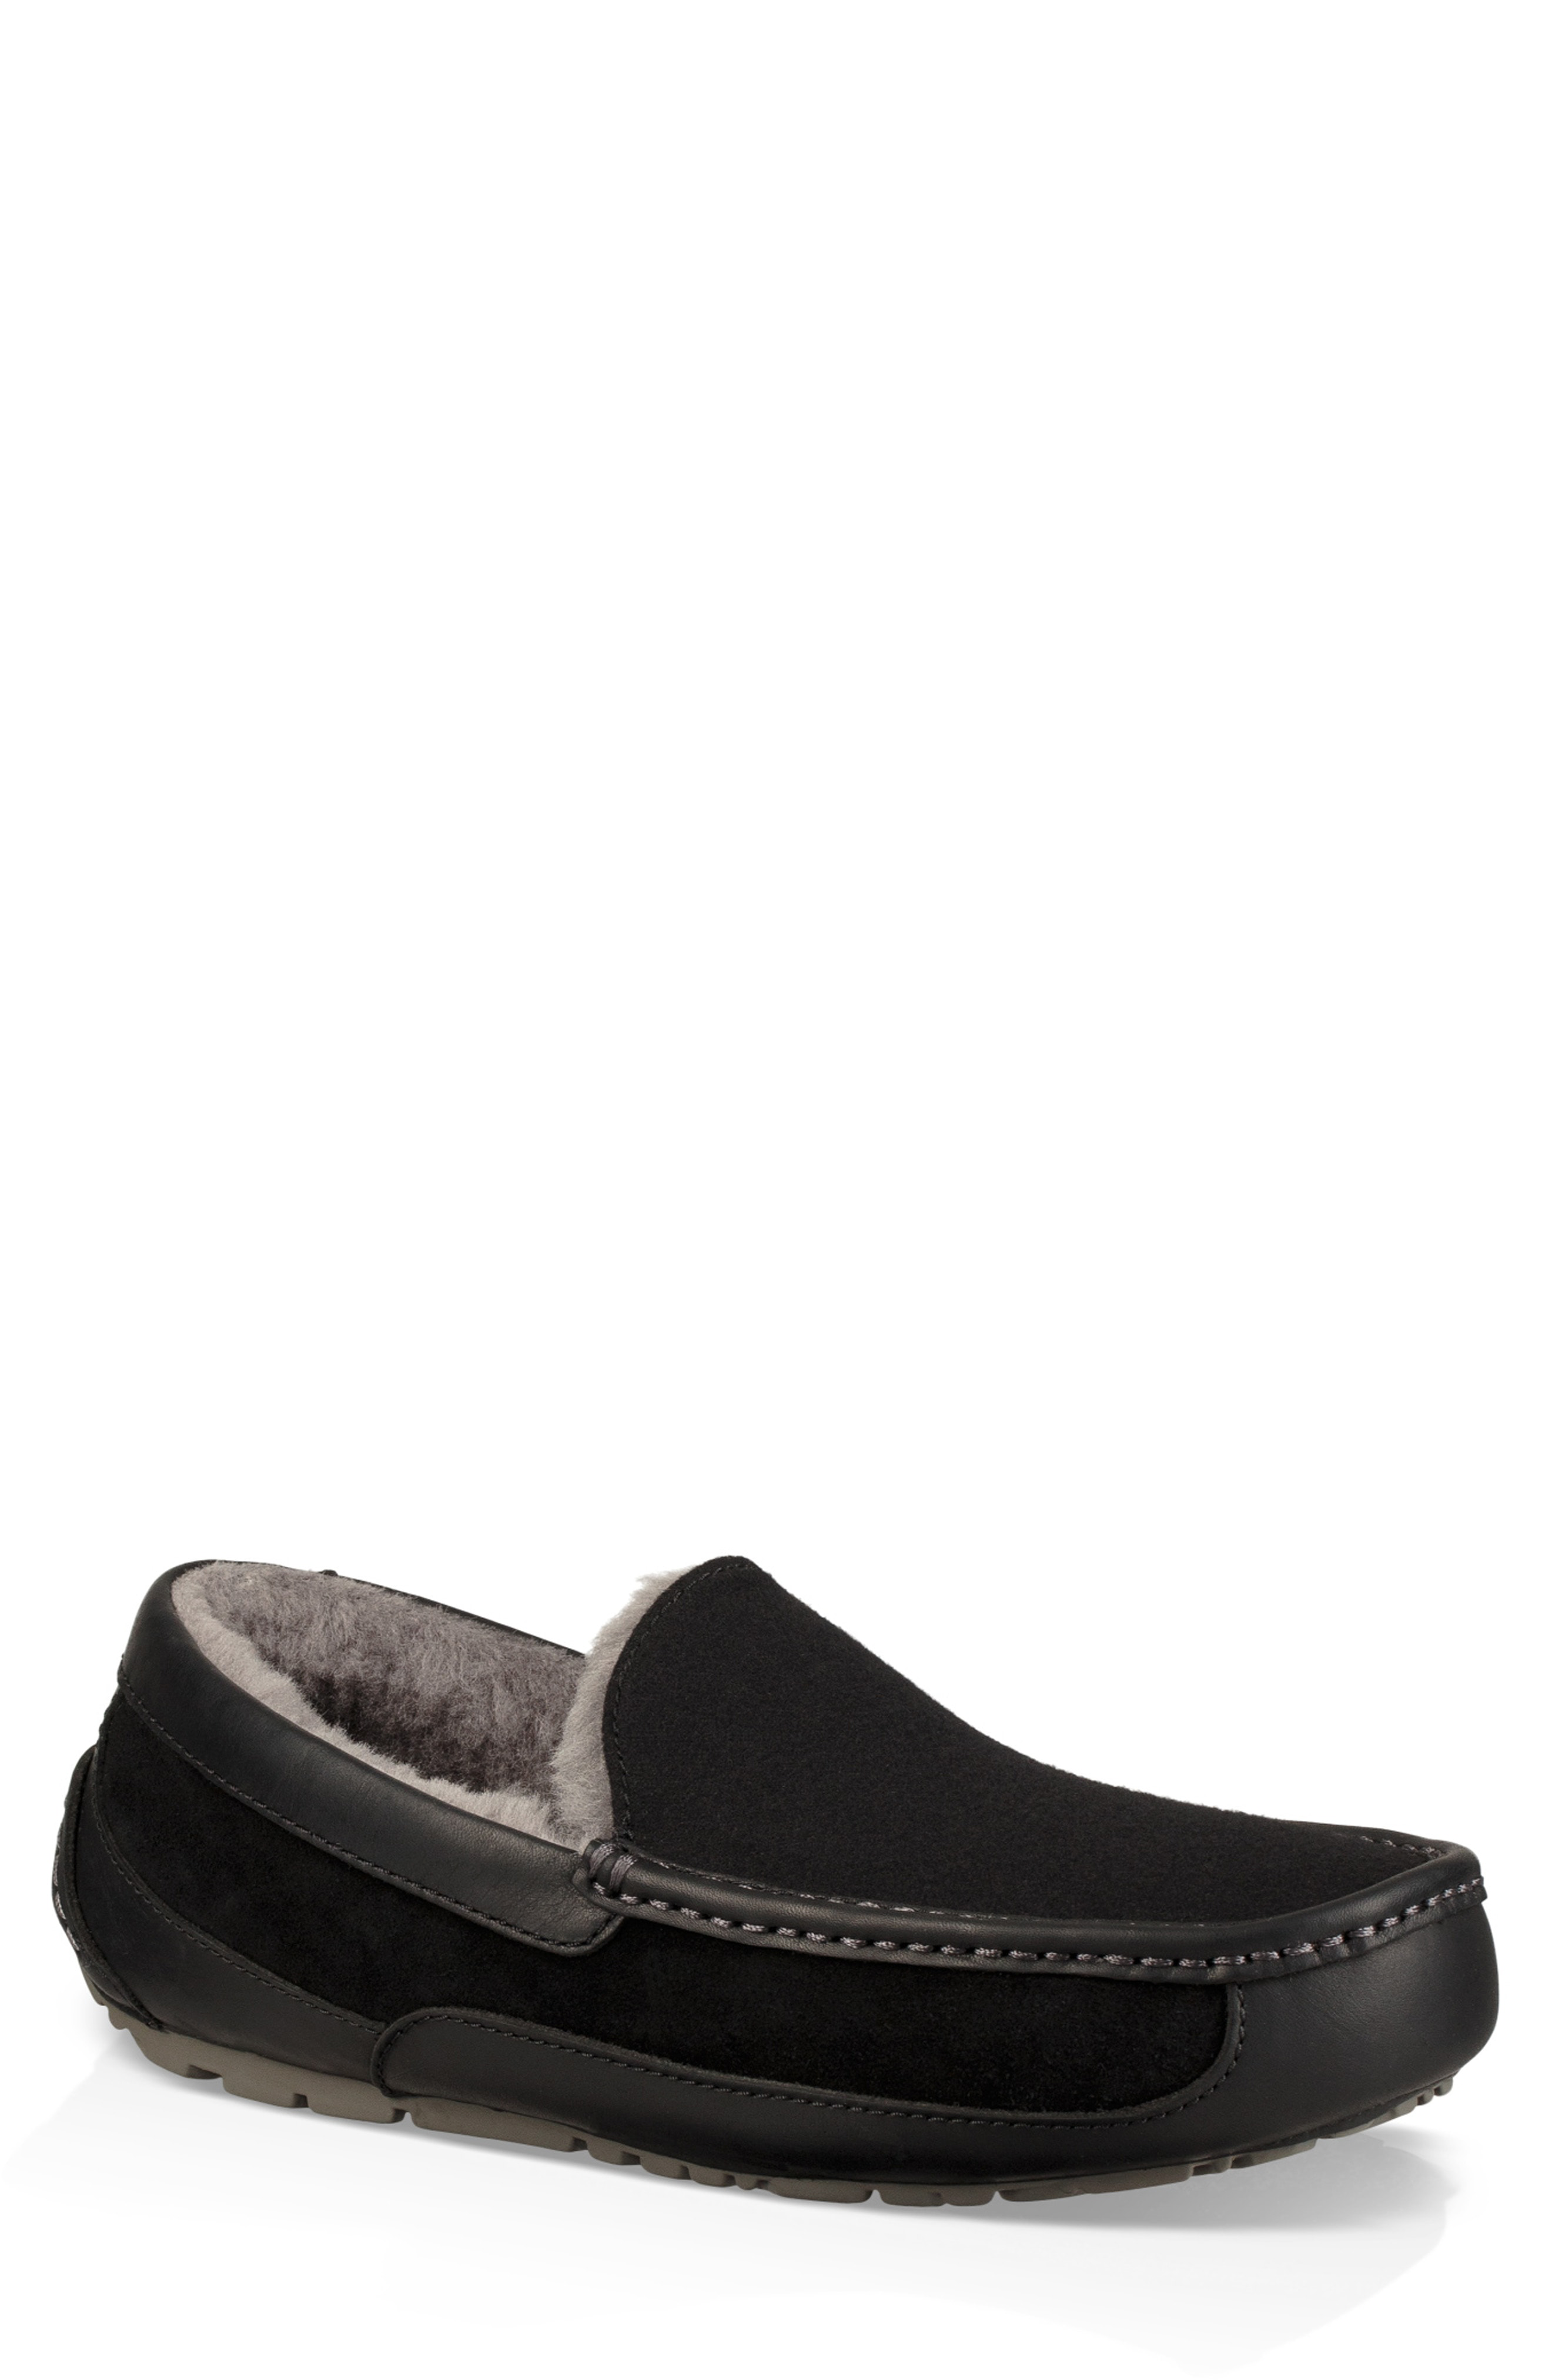 ac2bac774e17 Ugg Men s Ascot Leather-Trim Slippers In Black